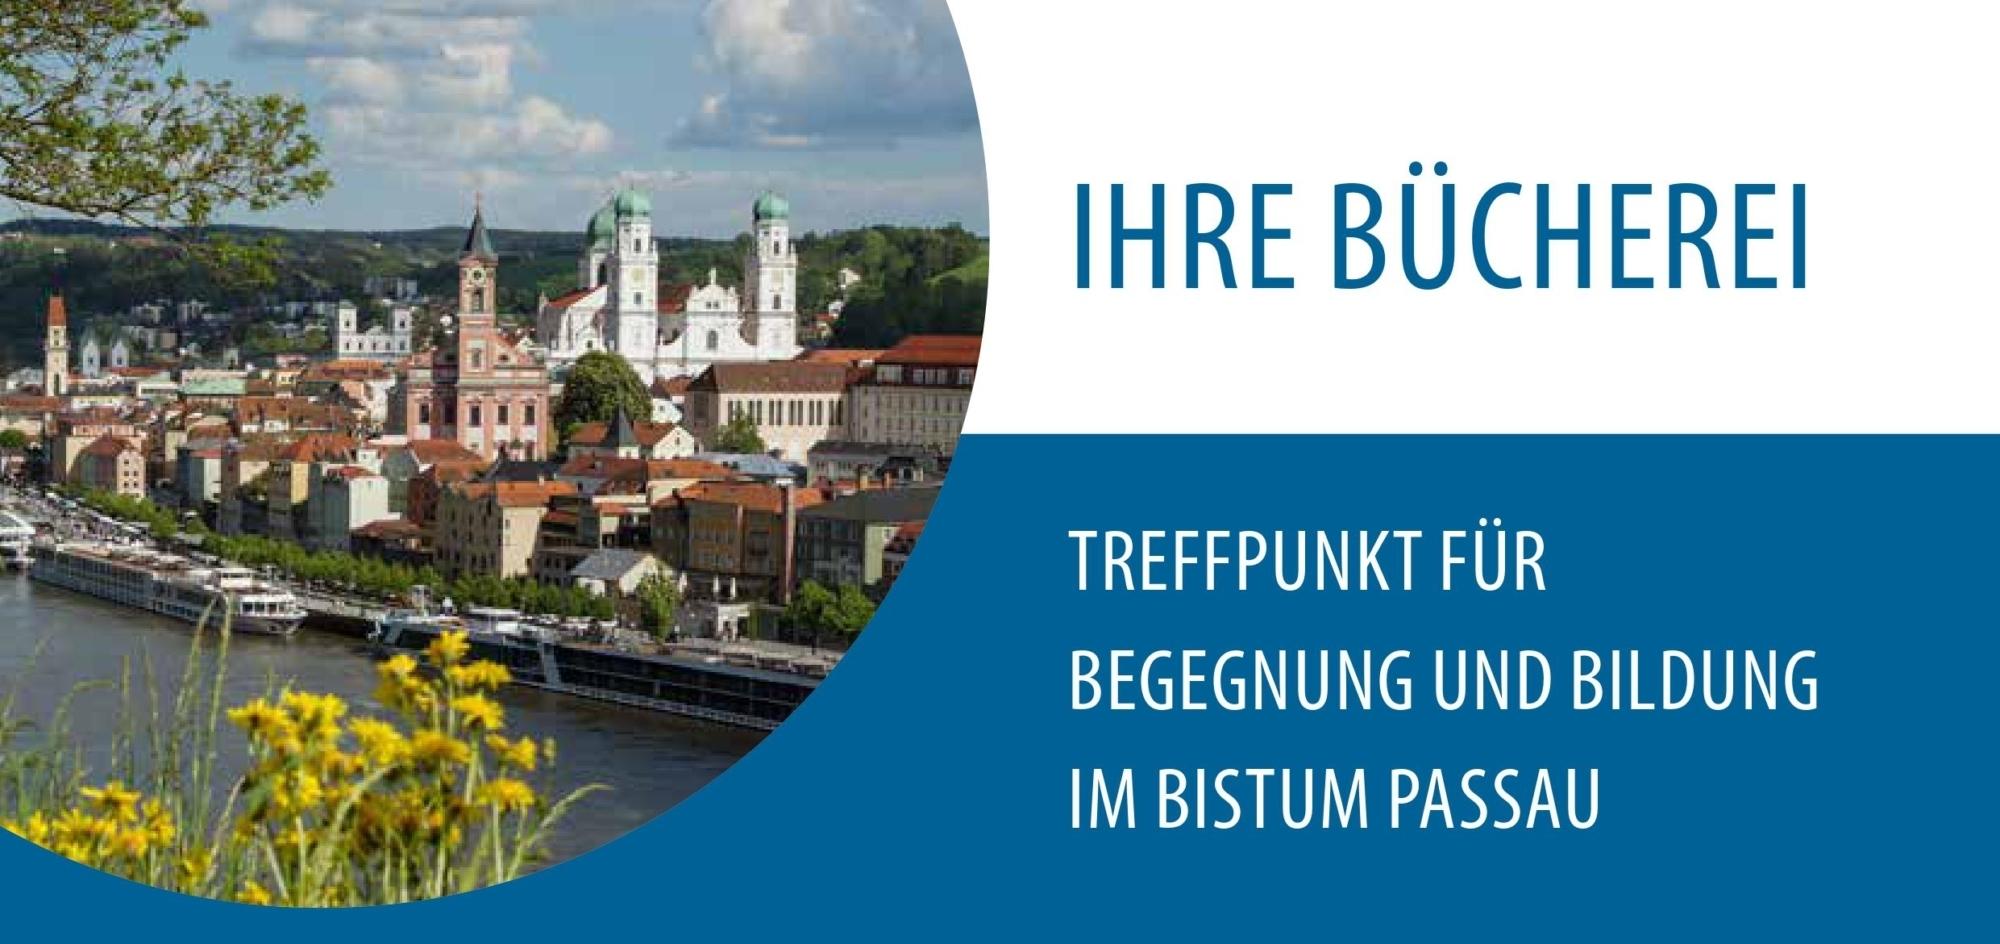 Statementflyer Passau